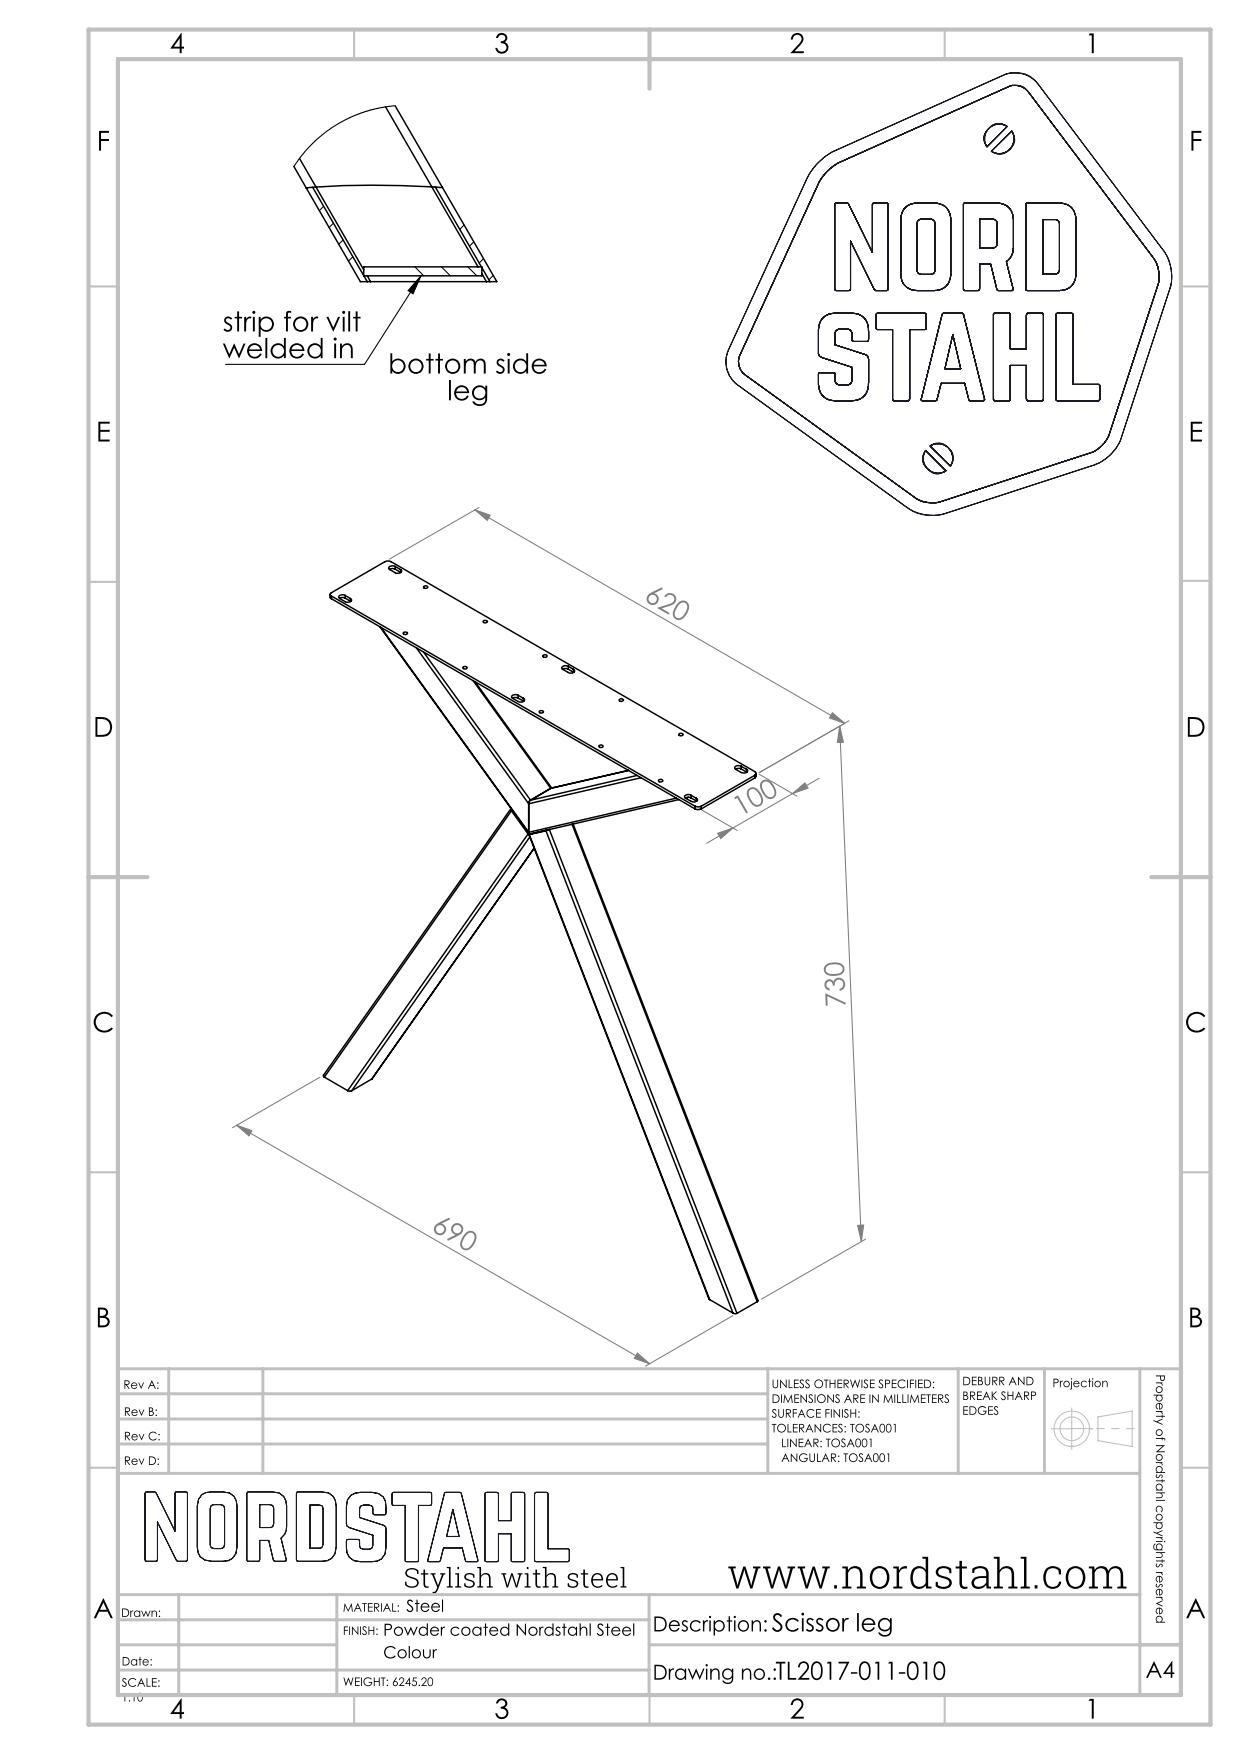 Nordstahl Scissor leg technische tekening